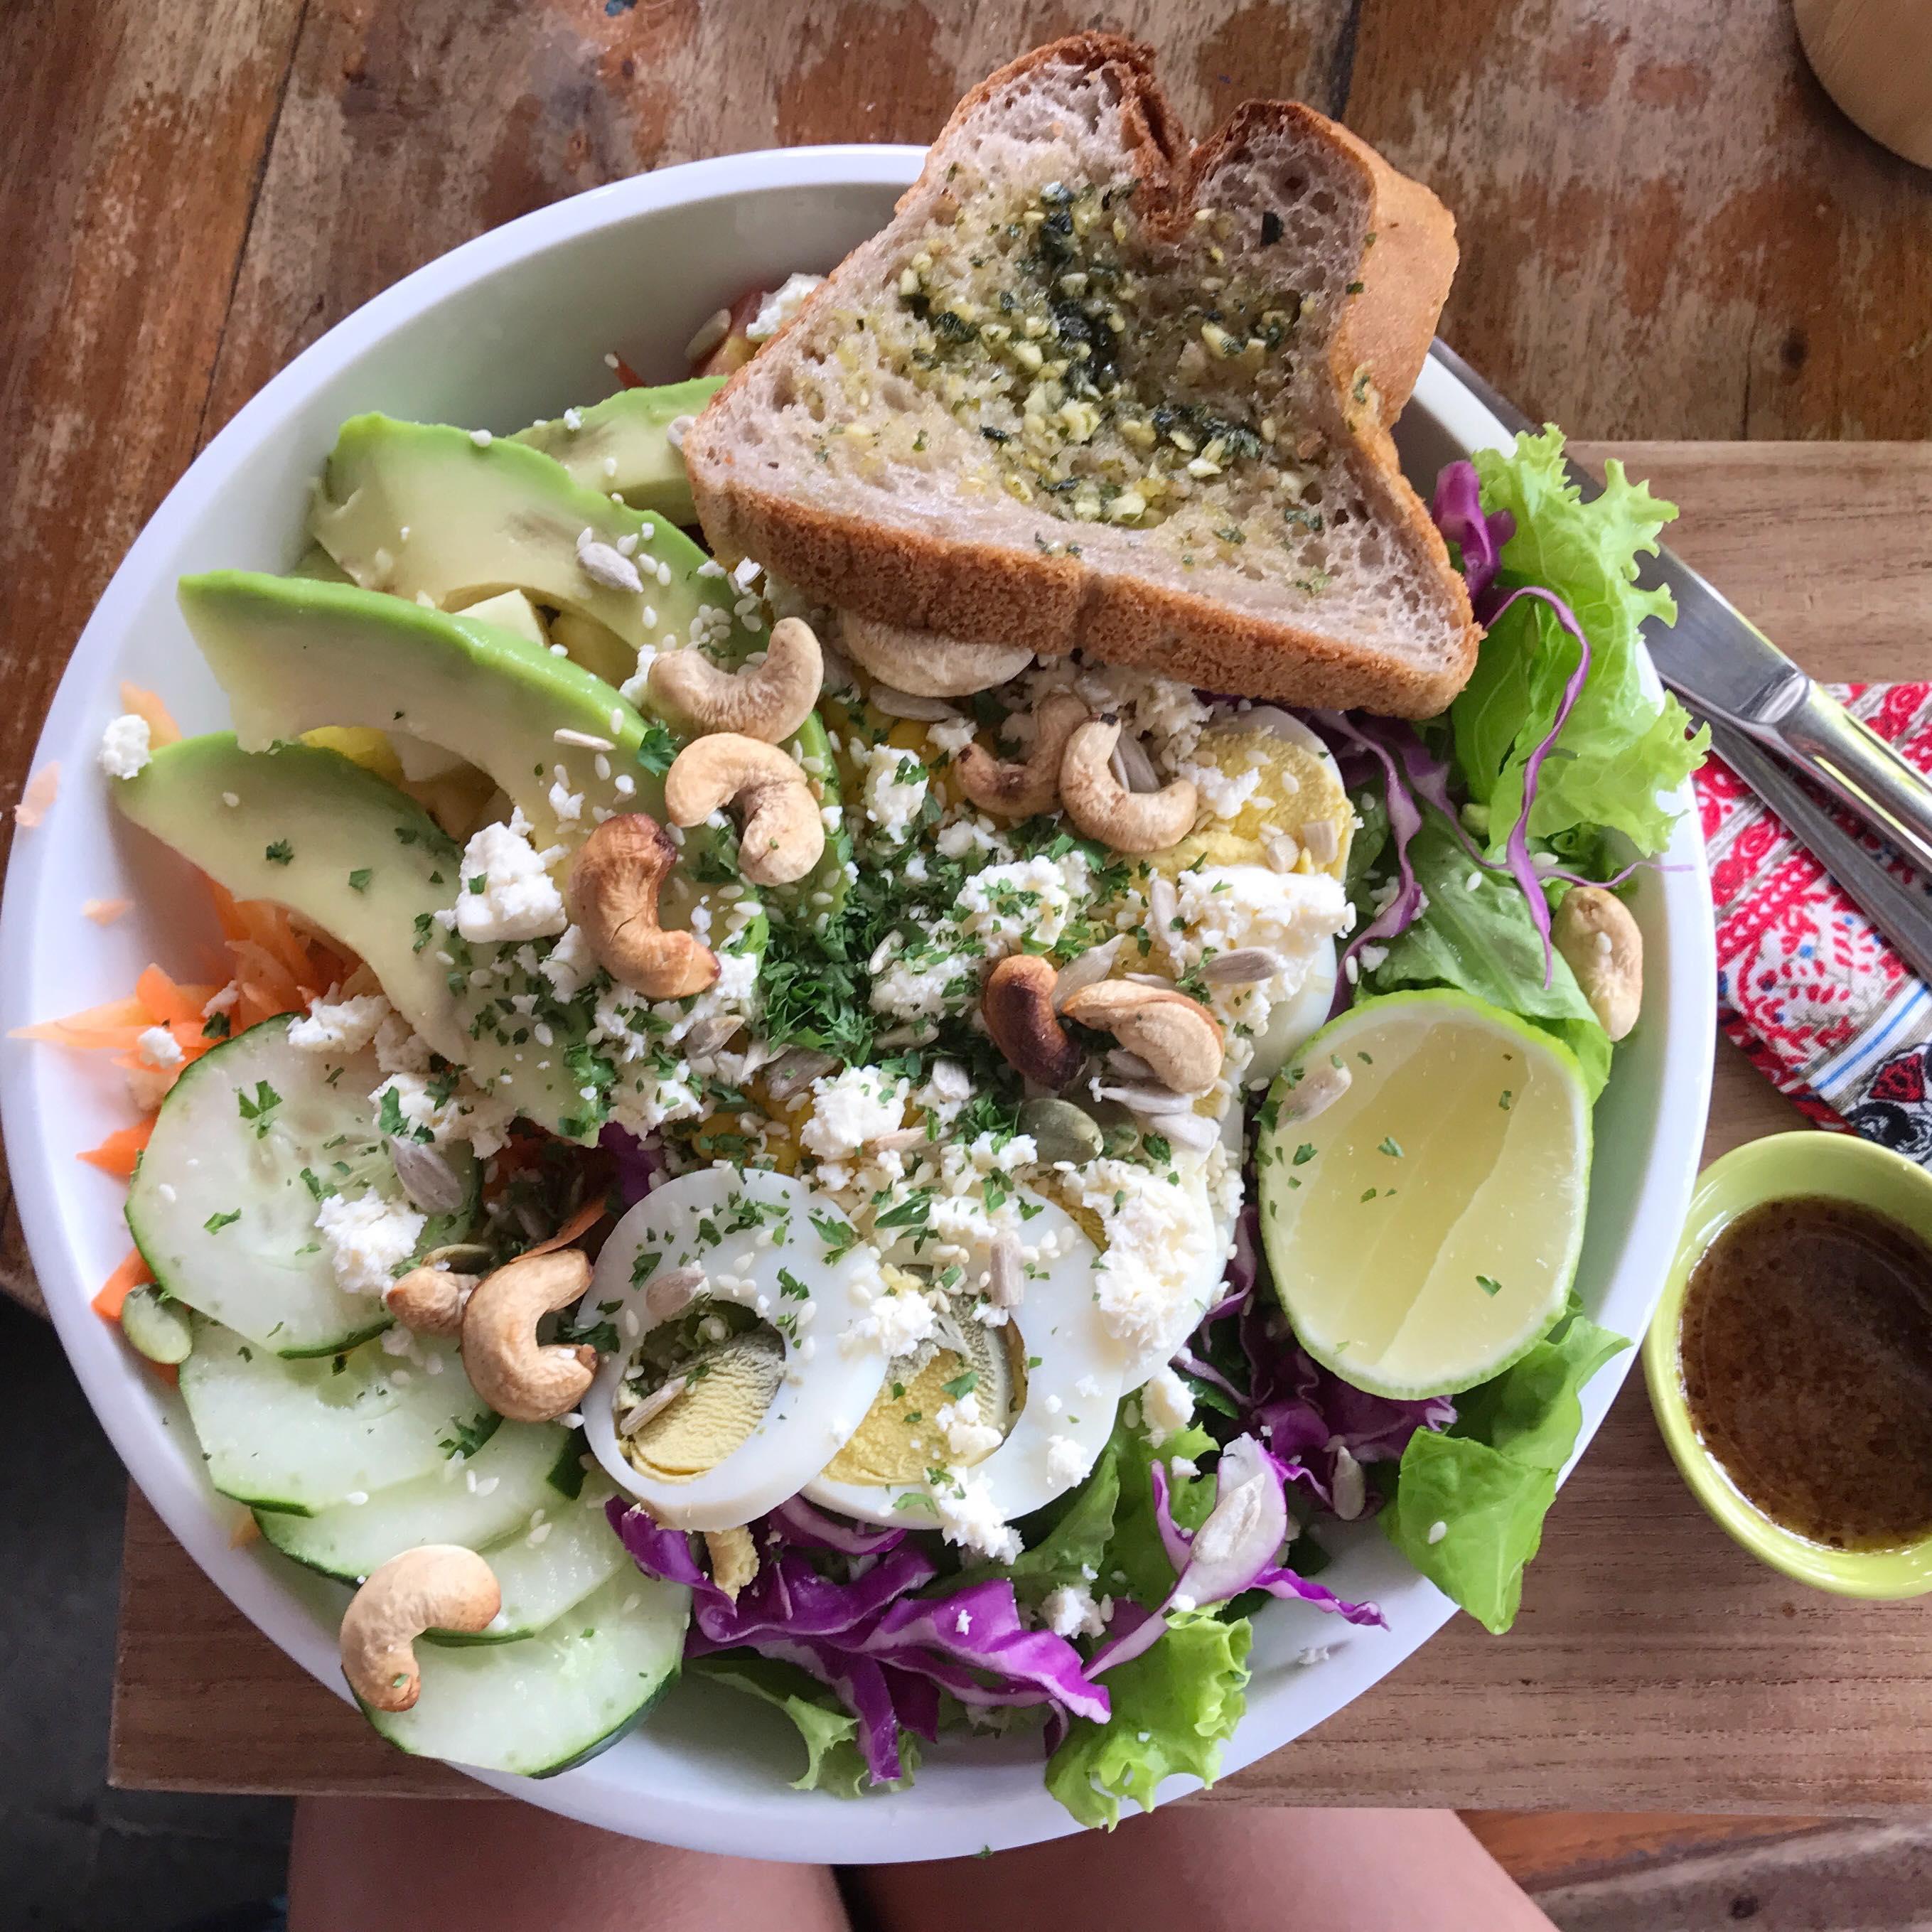 motion cafe salade veggie recette healthy bonne adresse healthy canggu bali.jpg